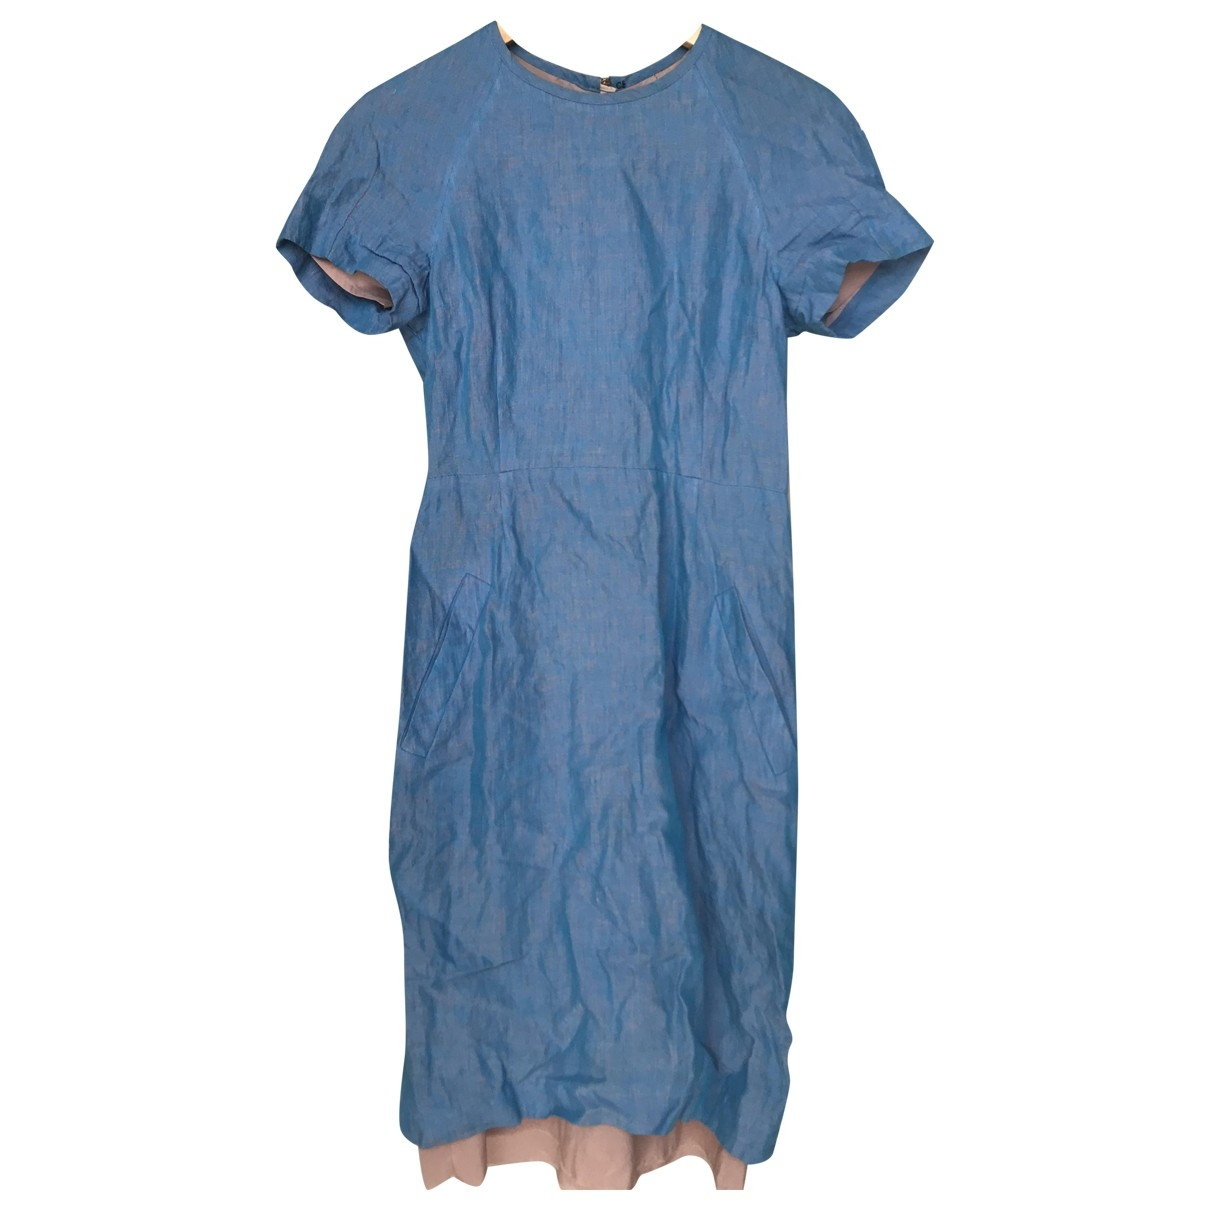 Acne Studios \N Blue Cotton dress for Women 38 FR